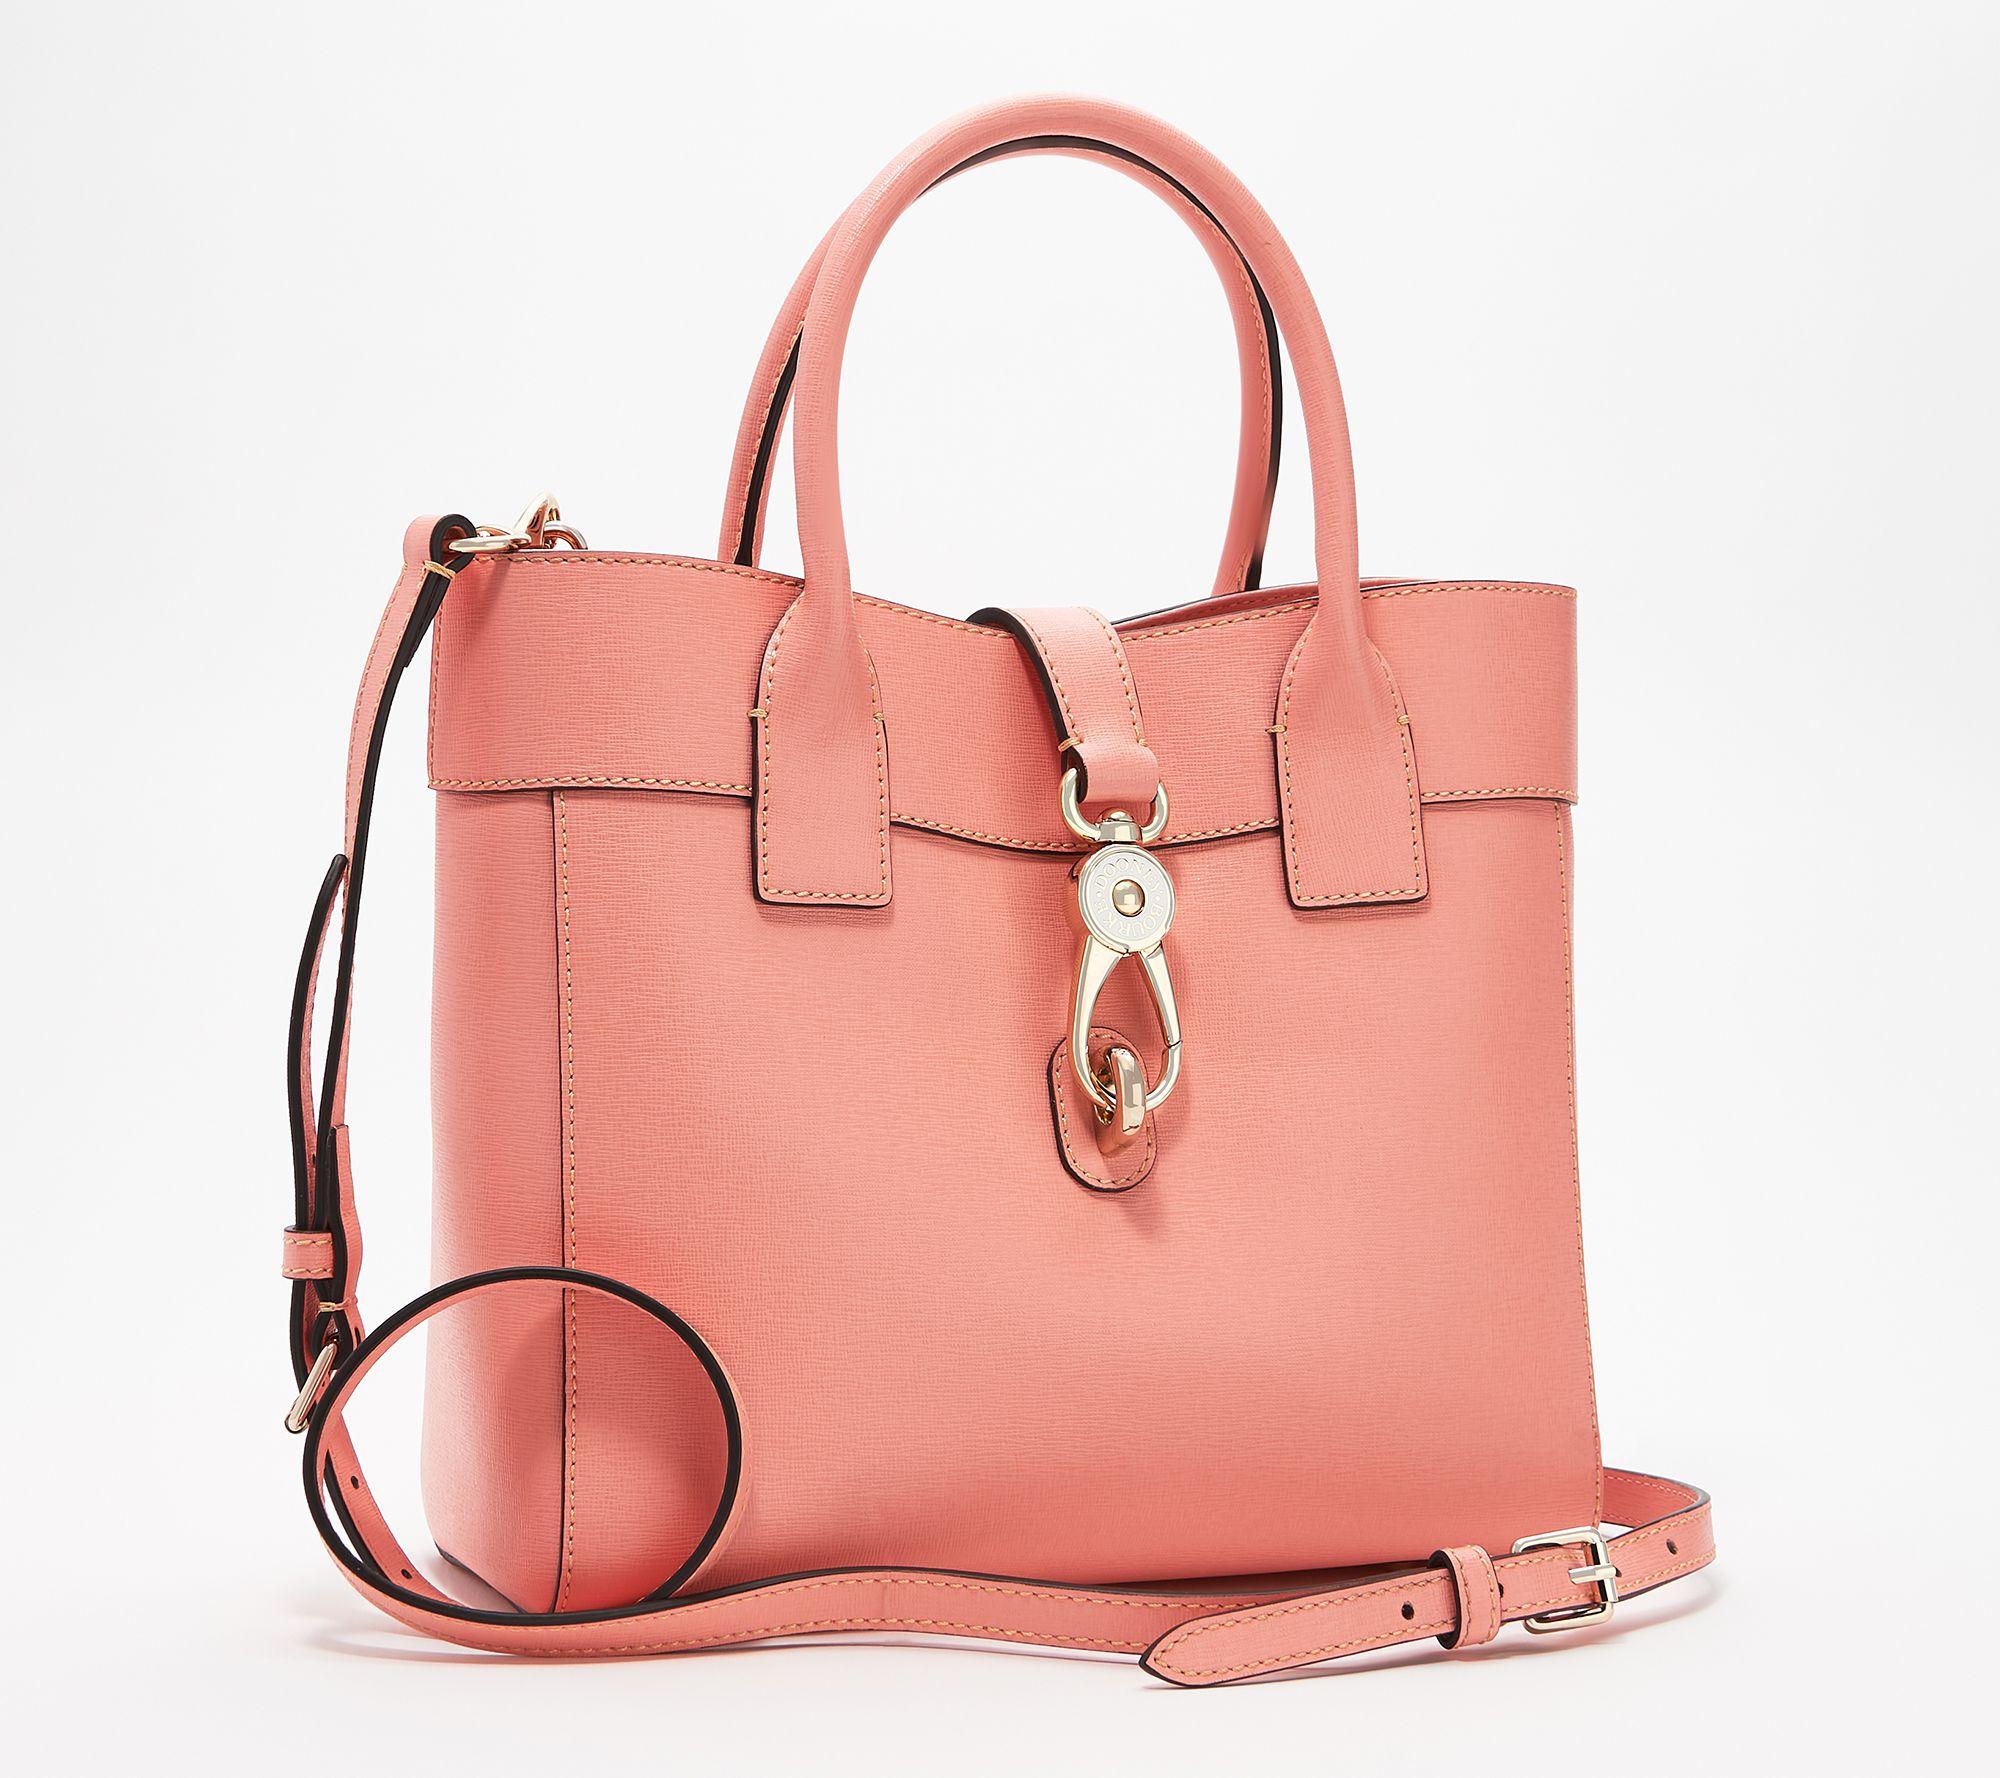 3387ec01eaff Dooney & Bourke Saffiano Leather Tote - Cara — QVC.com